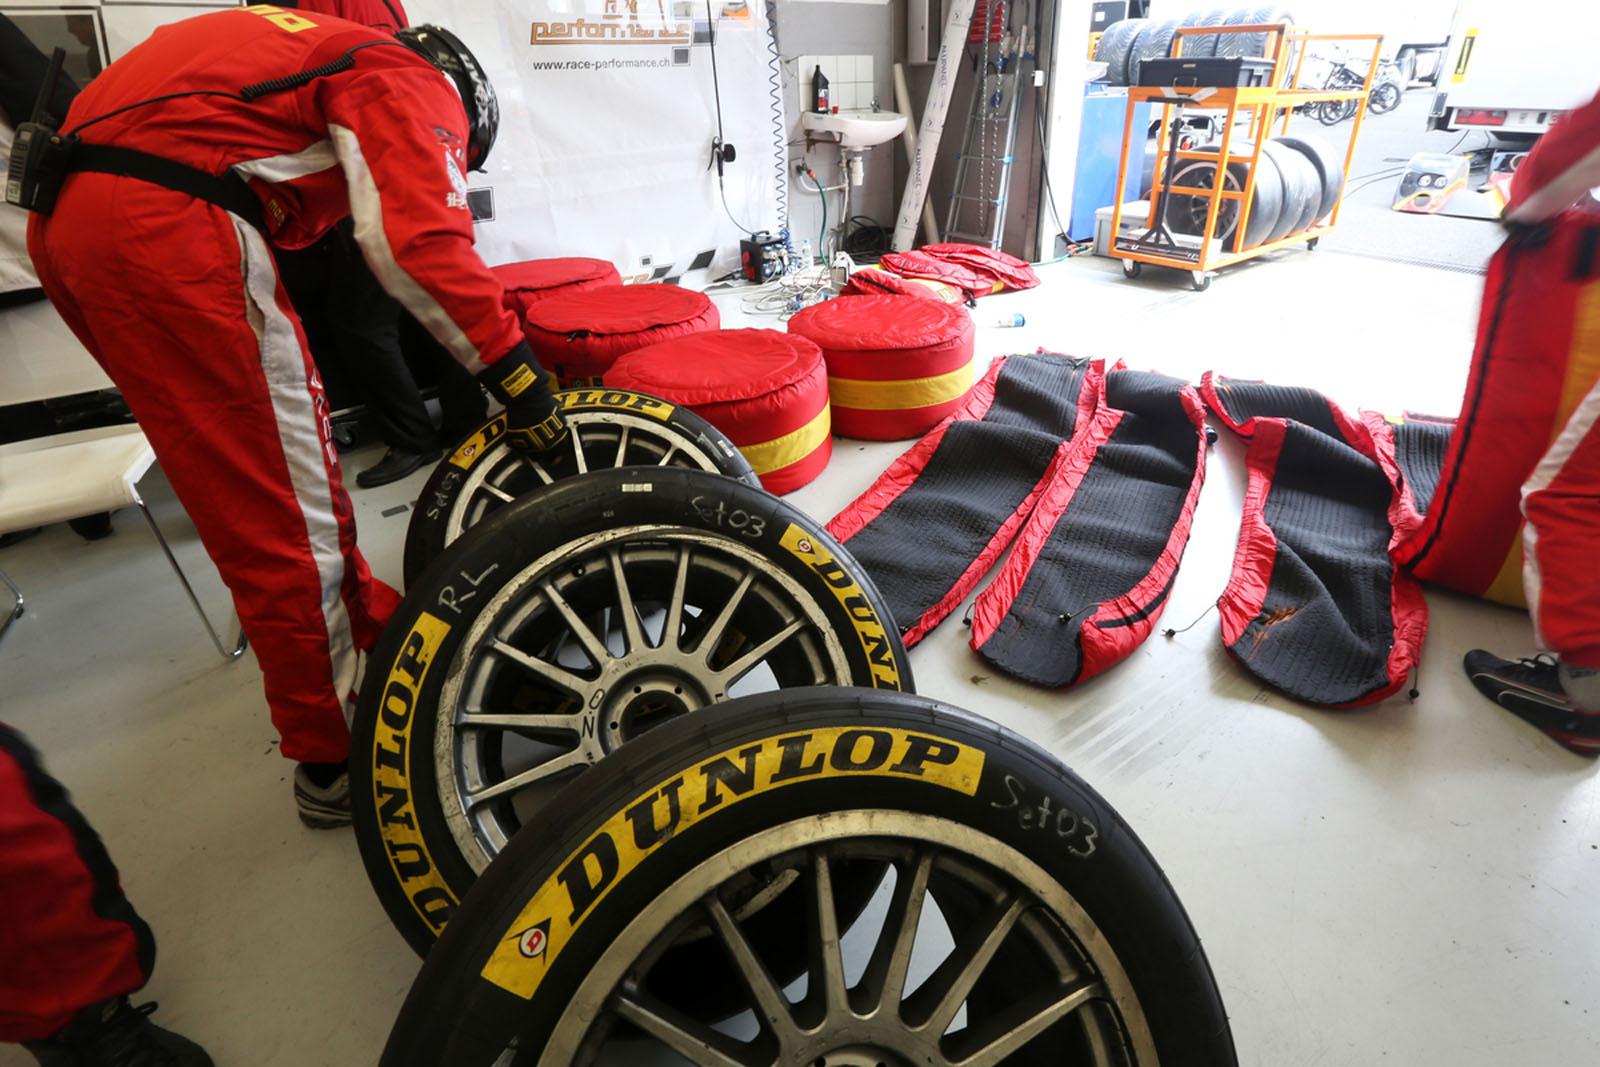 DUNLOP, pregatit pentru cursa de 24 de ore de la Le Mans